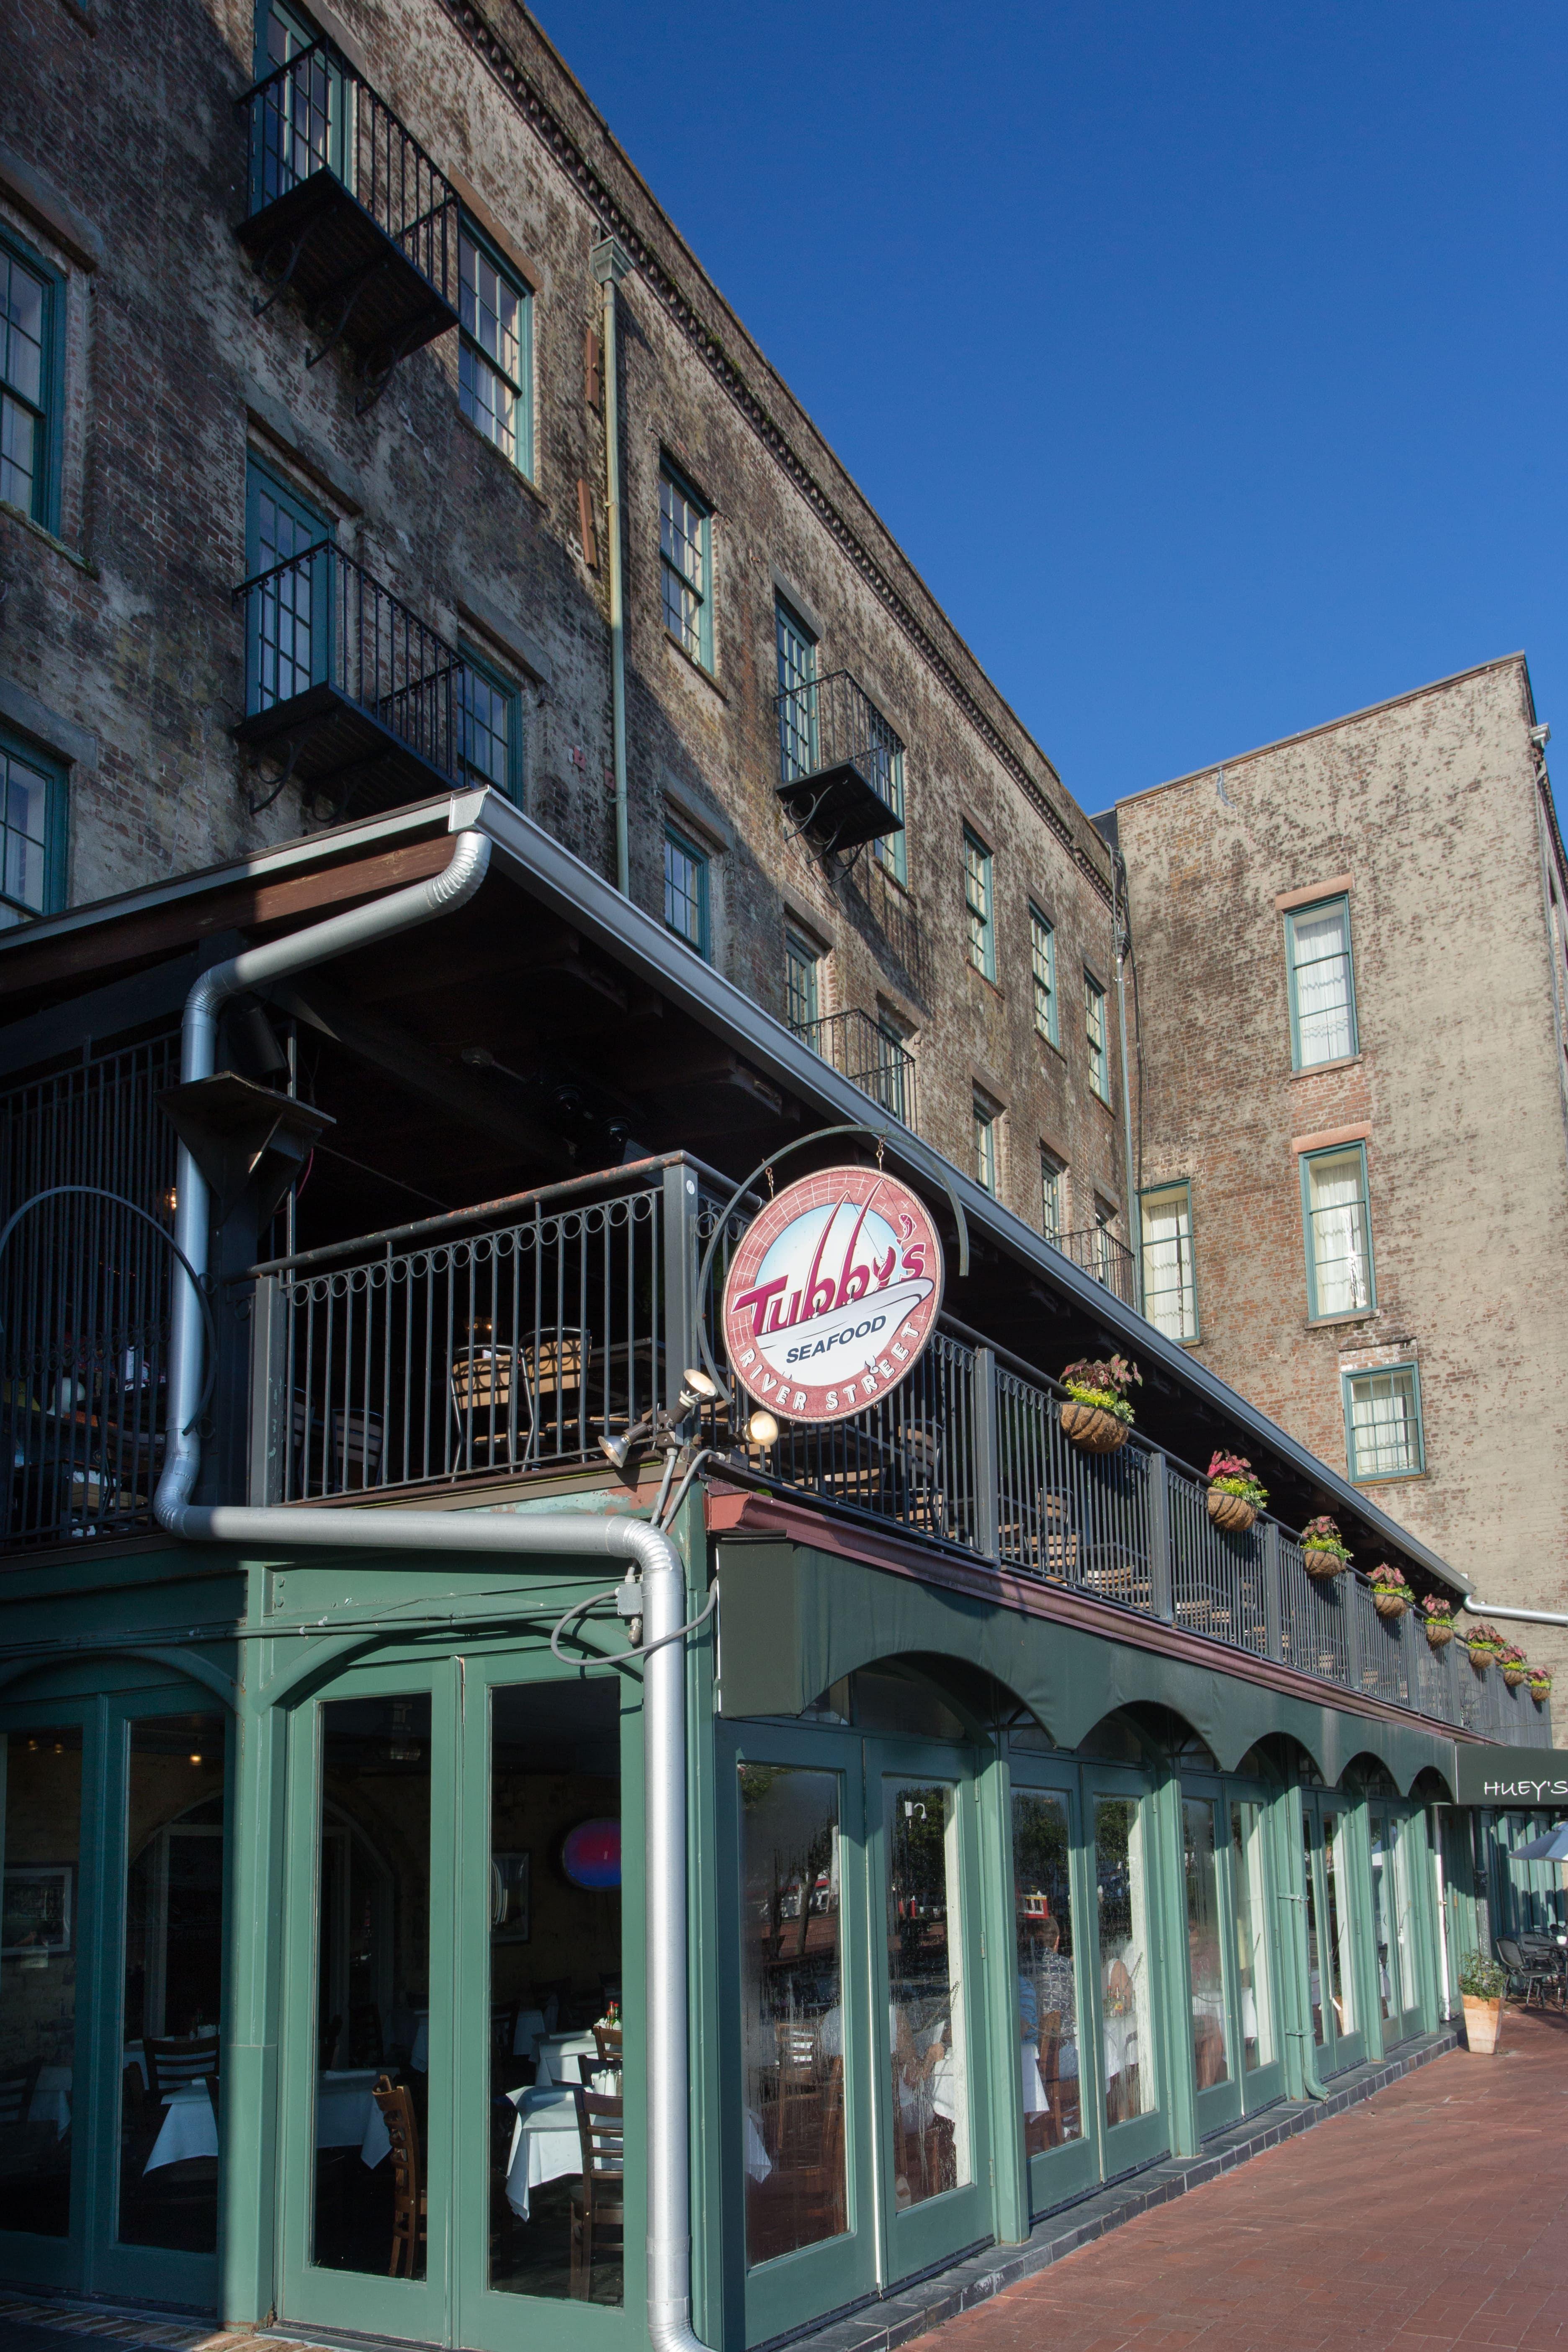 Tubby S River Streetrestaurant Tubby S River Street Savannah Chat Street River